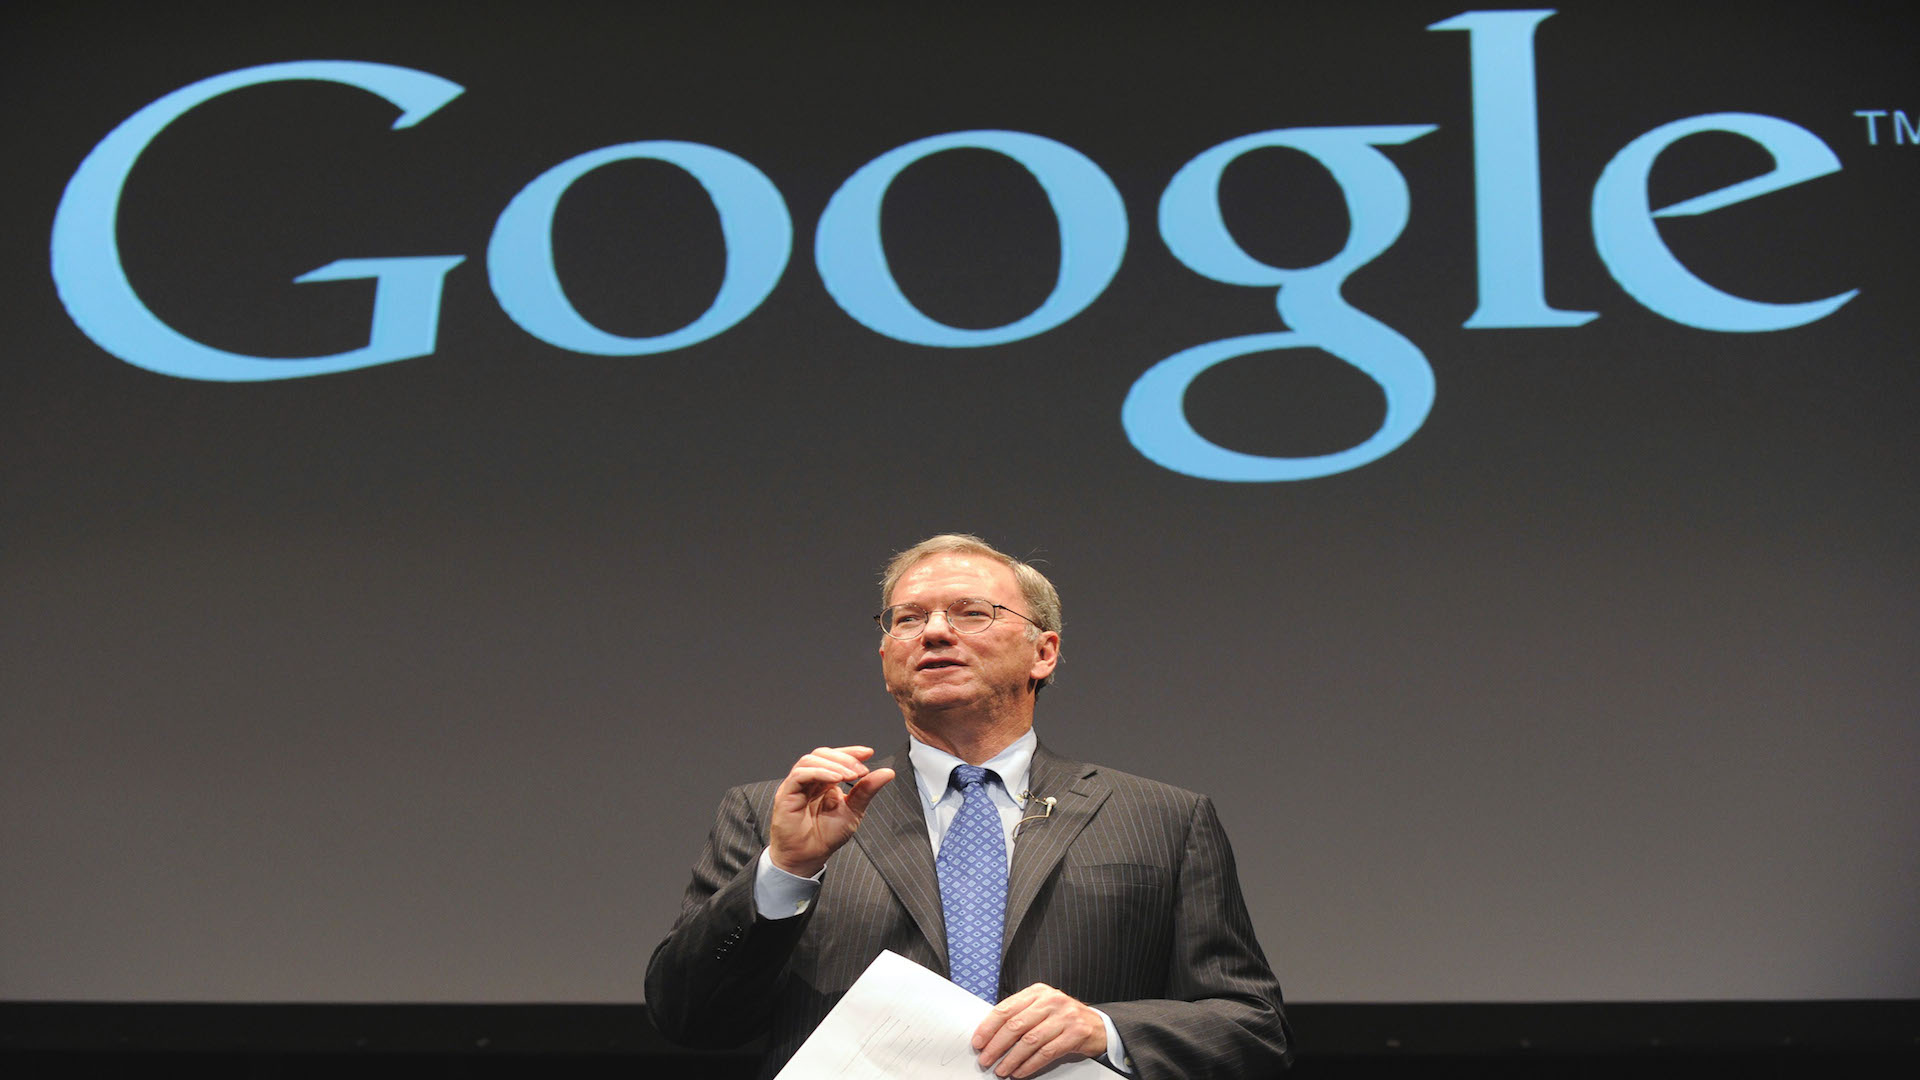 Google considera que la MPAA y el fiscal de Mississippi buscan impulsar leyes contra la libertad en Internet.